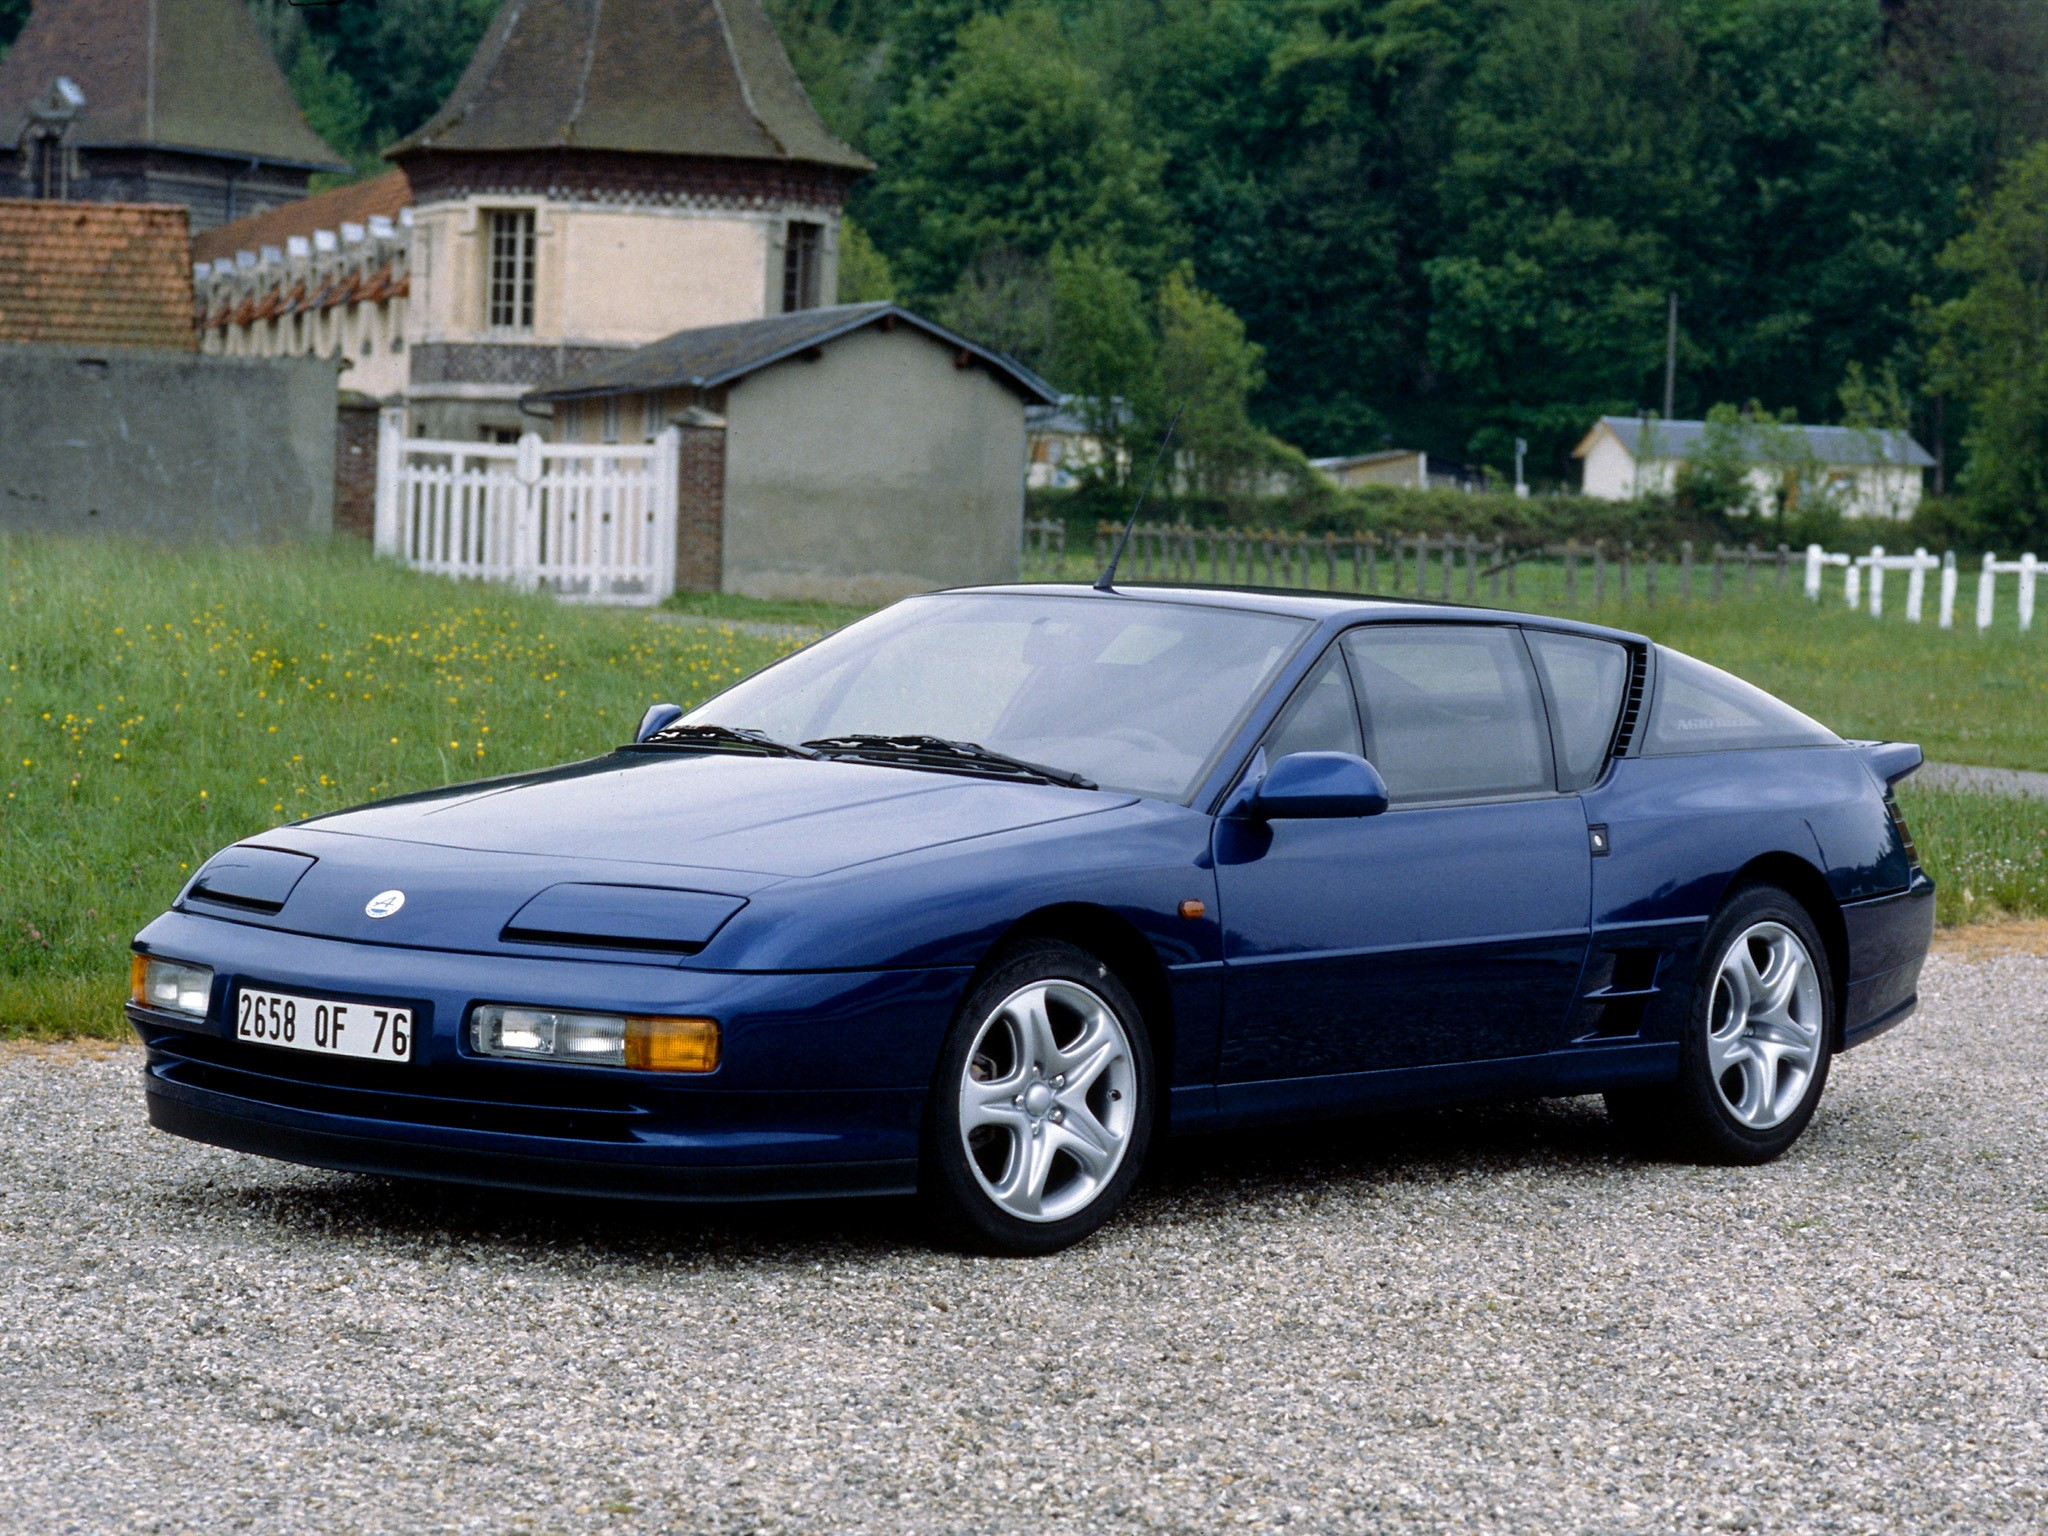 renault alpine a610 specs 1991 1992 1993 1994 autoevolution. Black Bedroom Furniture Sets. Home Design Ideas